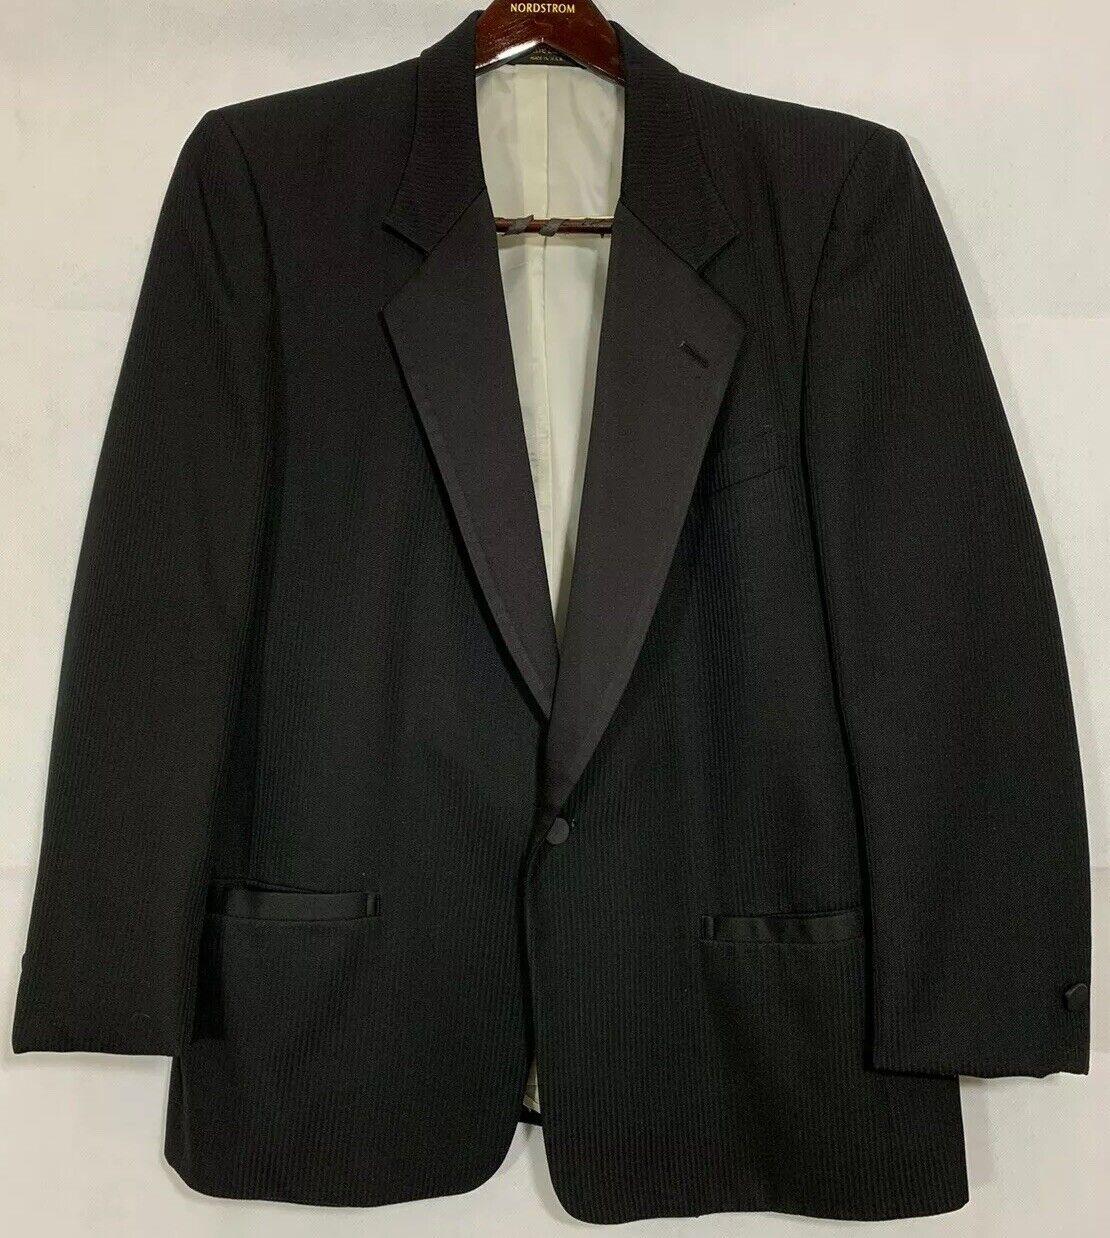 Mens Pierre Cardin Black Striped Tuxedo Jacket Satin Lapels 1 Button Size 36S